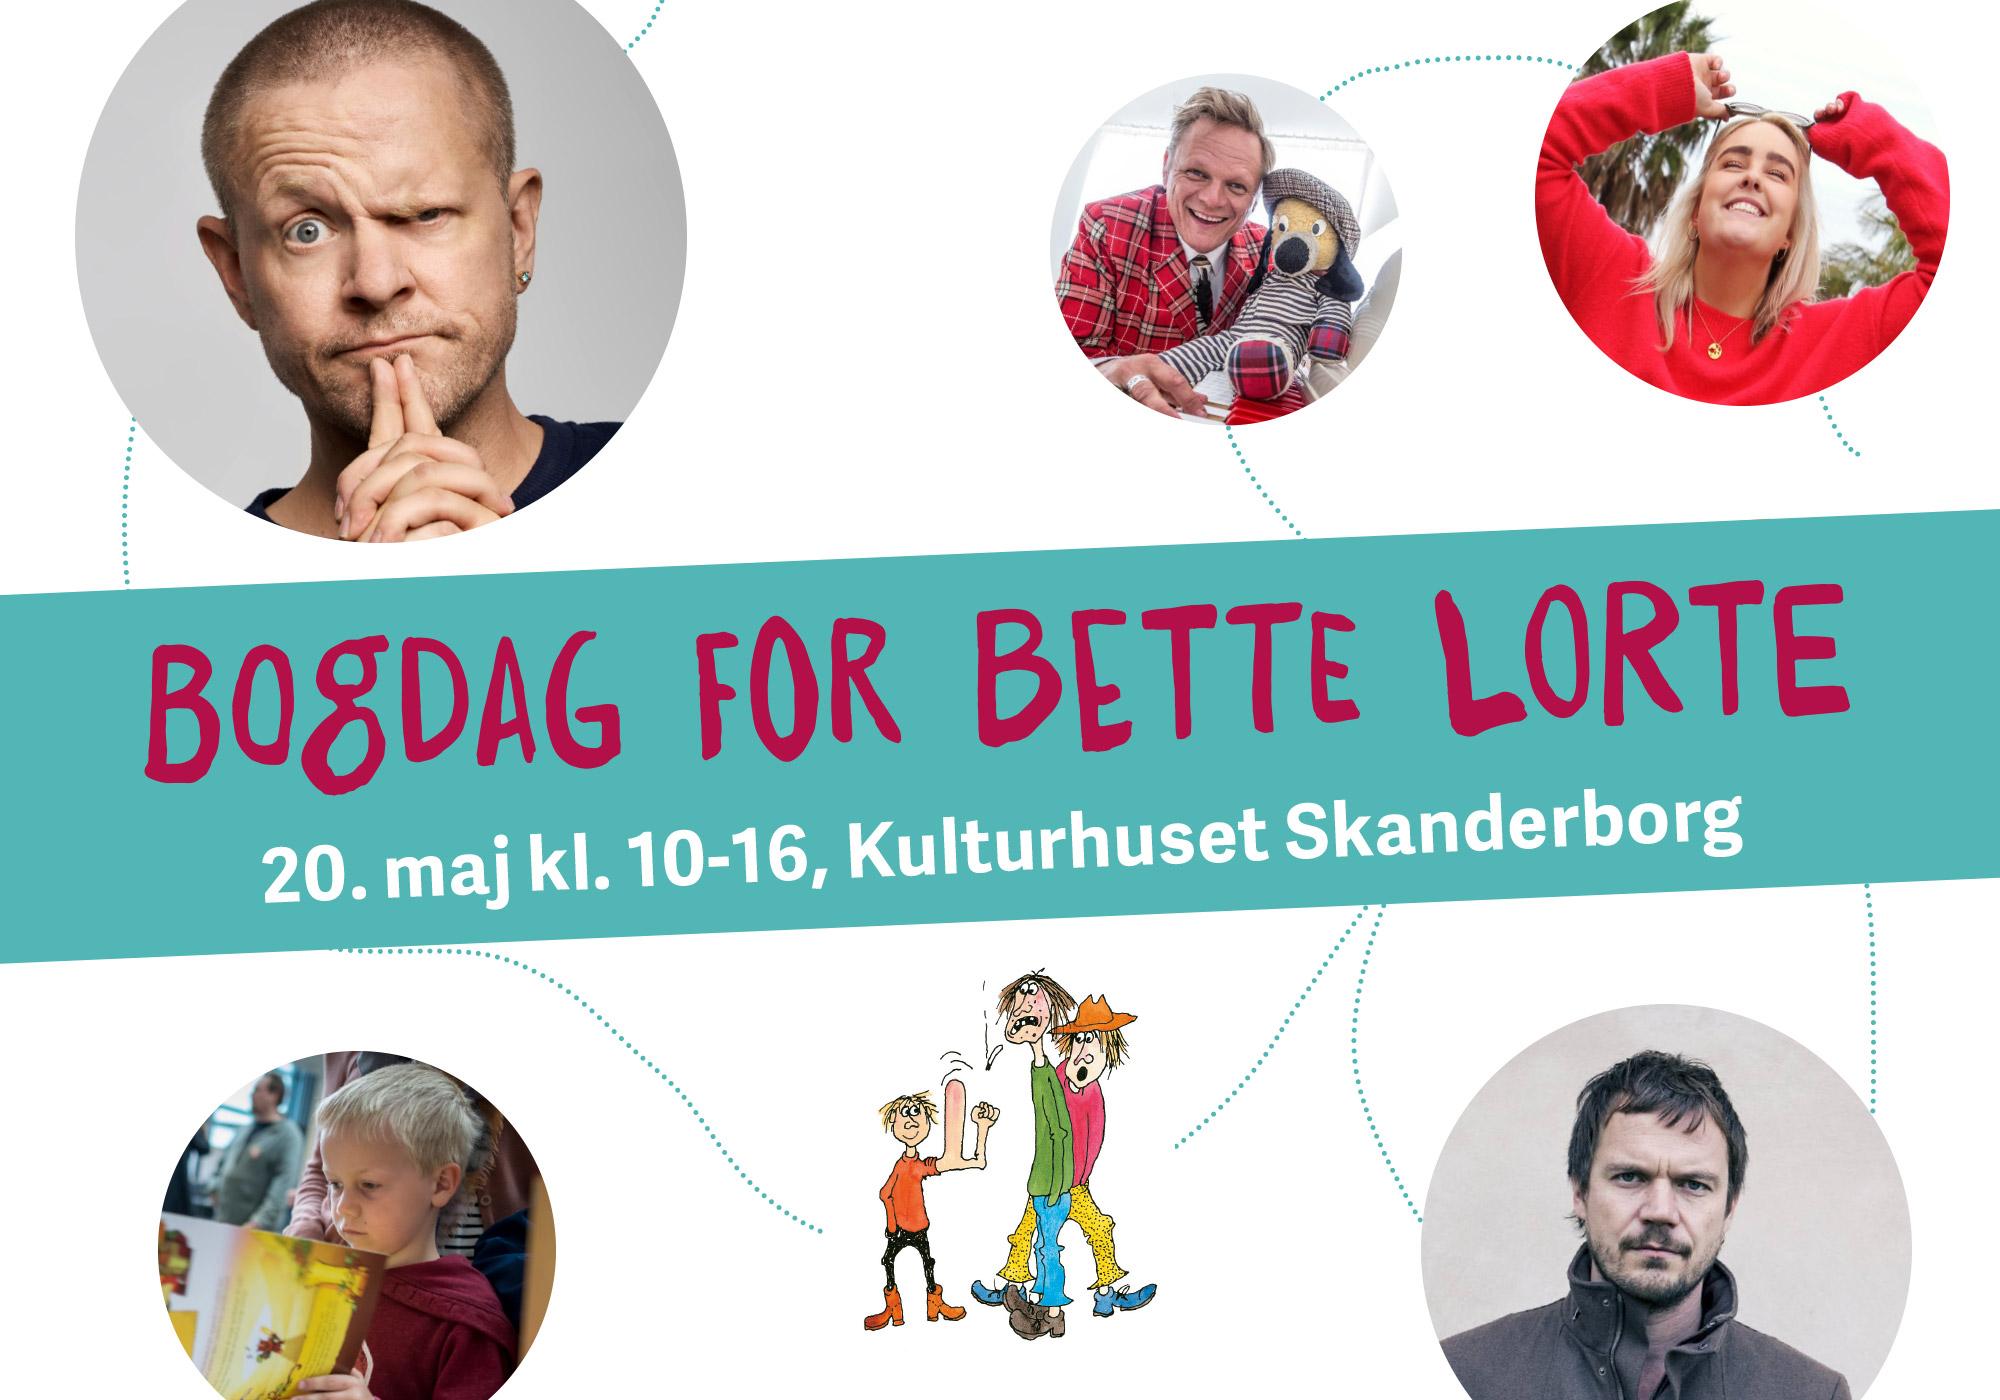 Sløngeldage Bogfestival  (CASE COMING SOON)